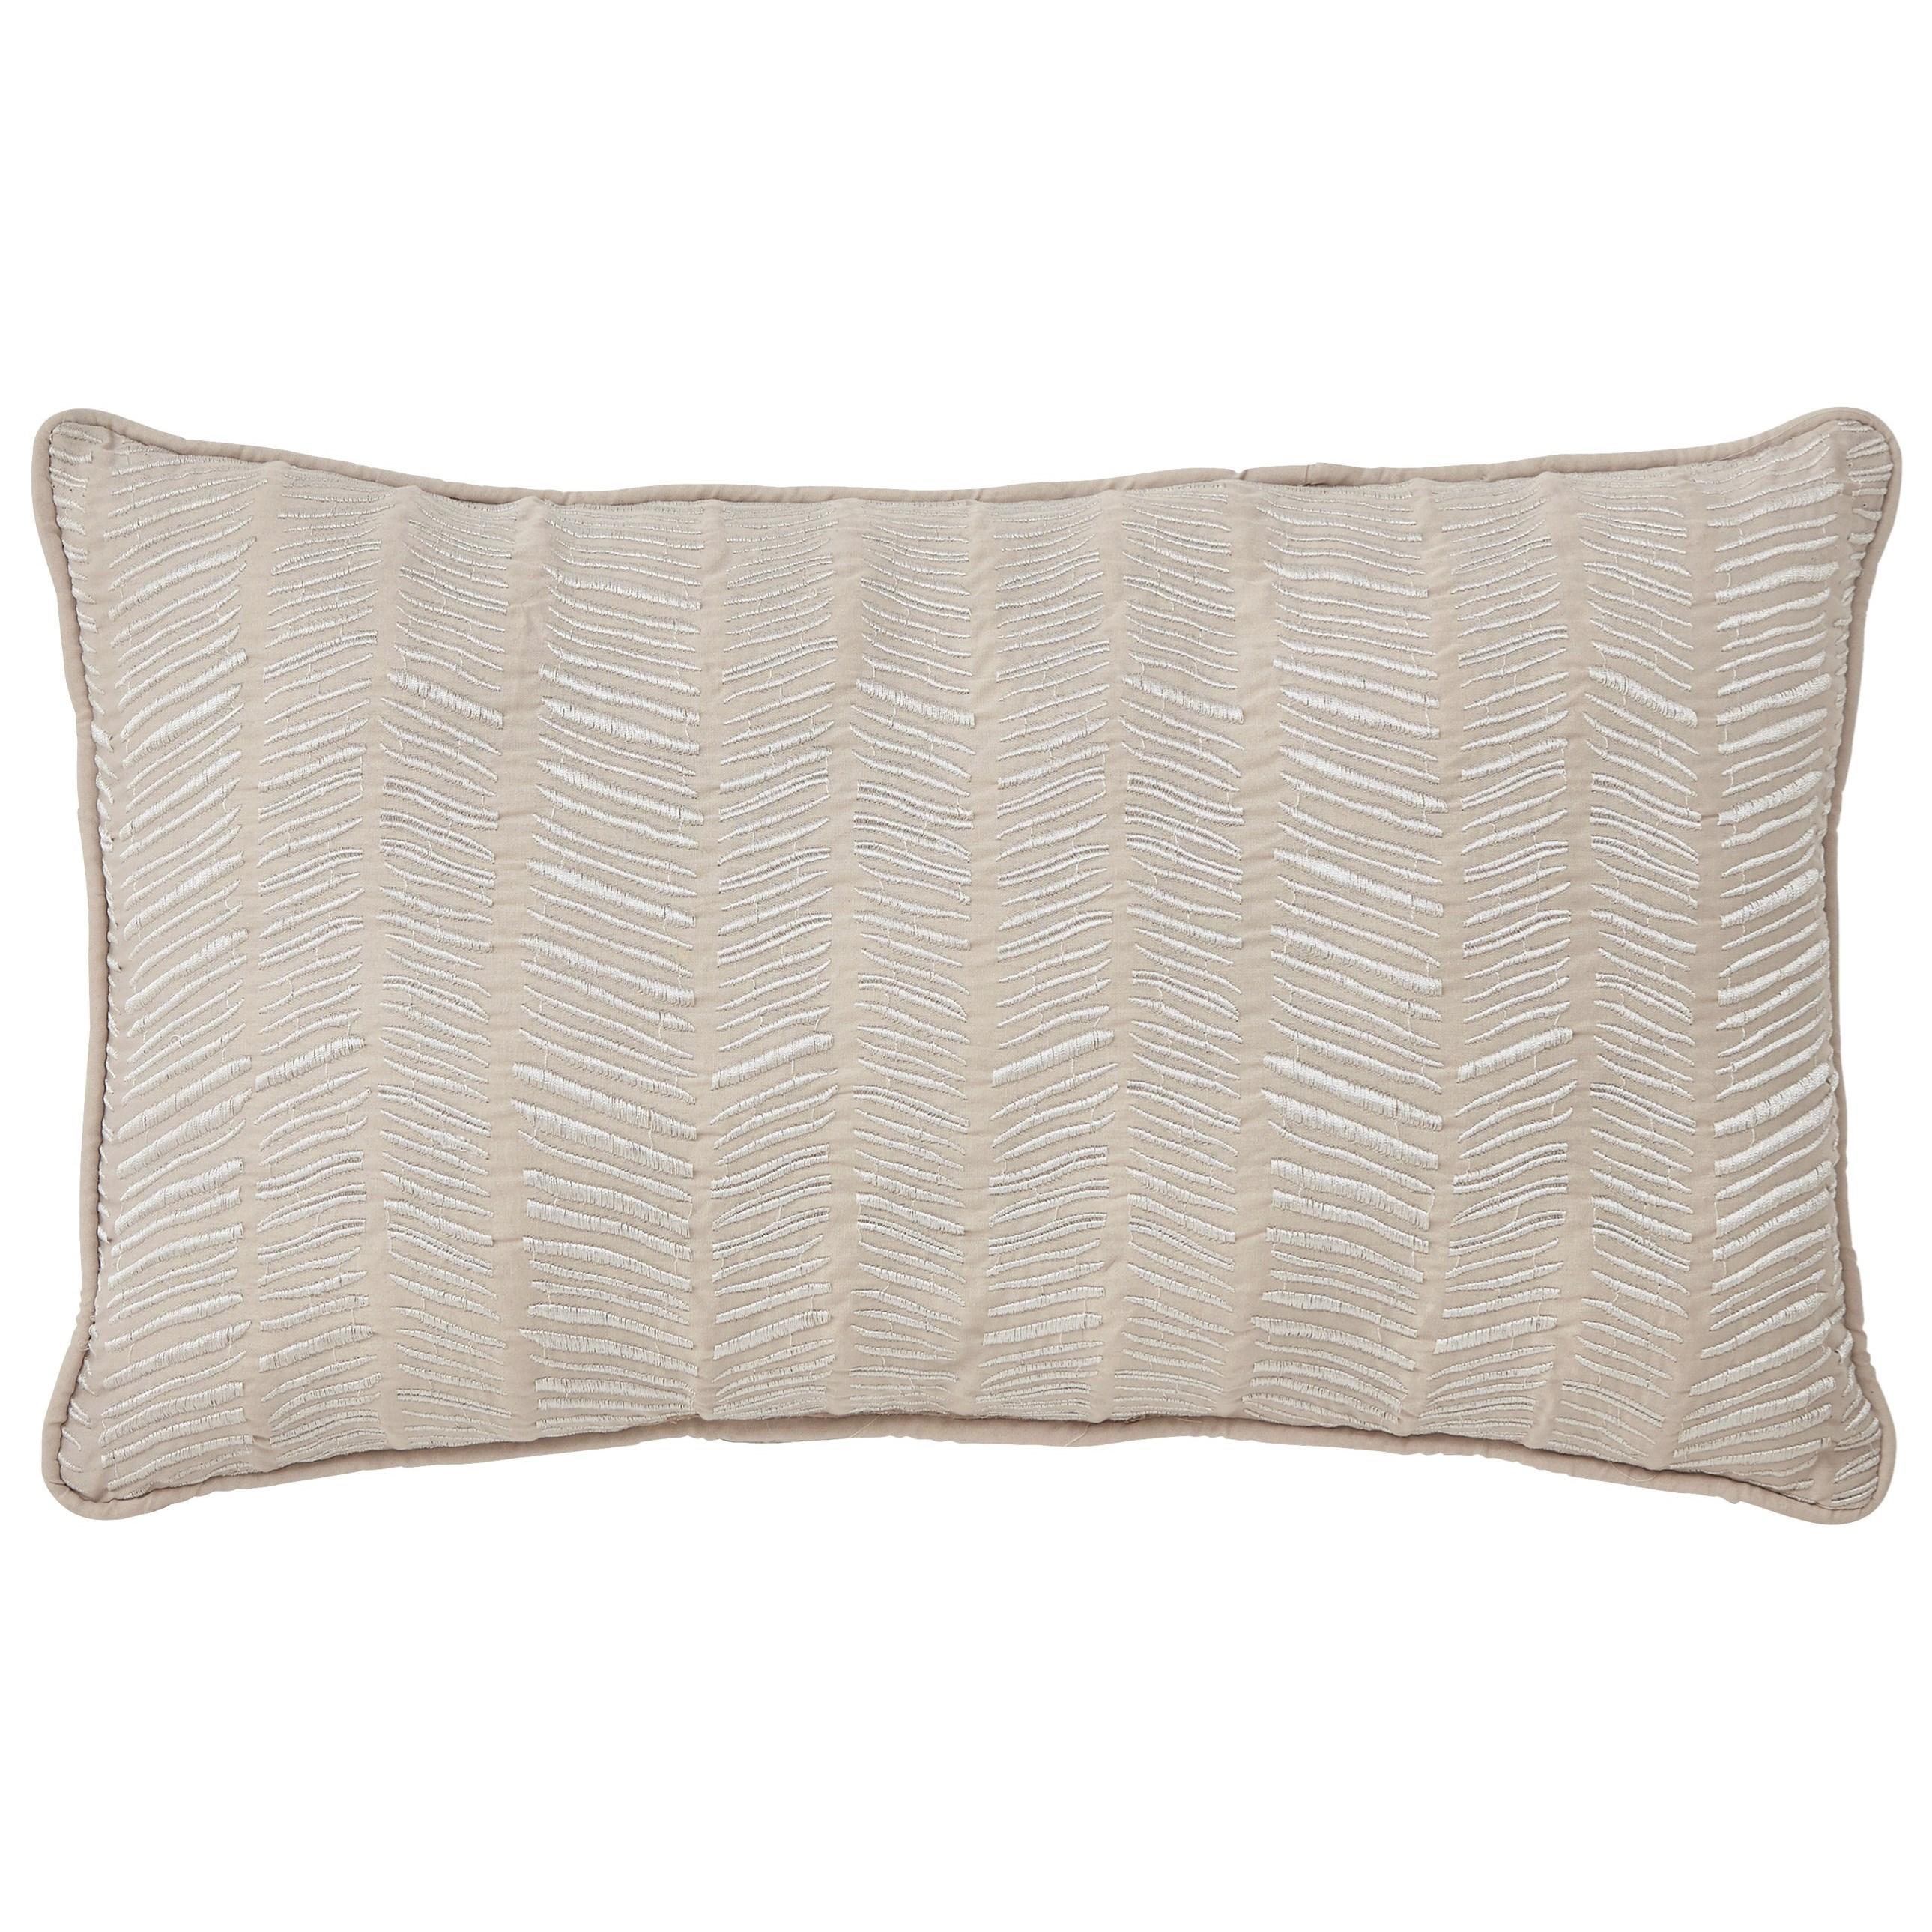 Signature Design by Ashley Pillows Canton - Cream Lumbar Pillow - Item Number: A1000331P